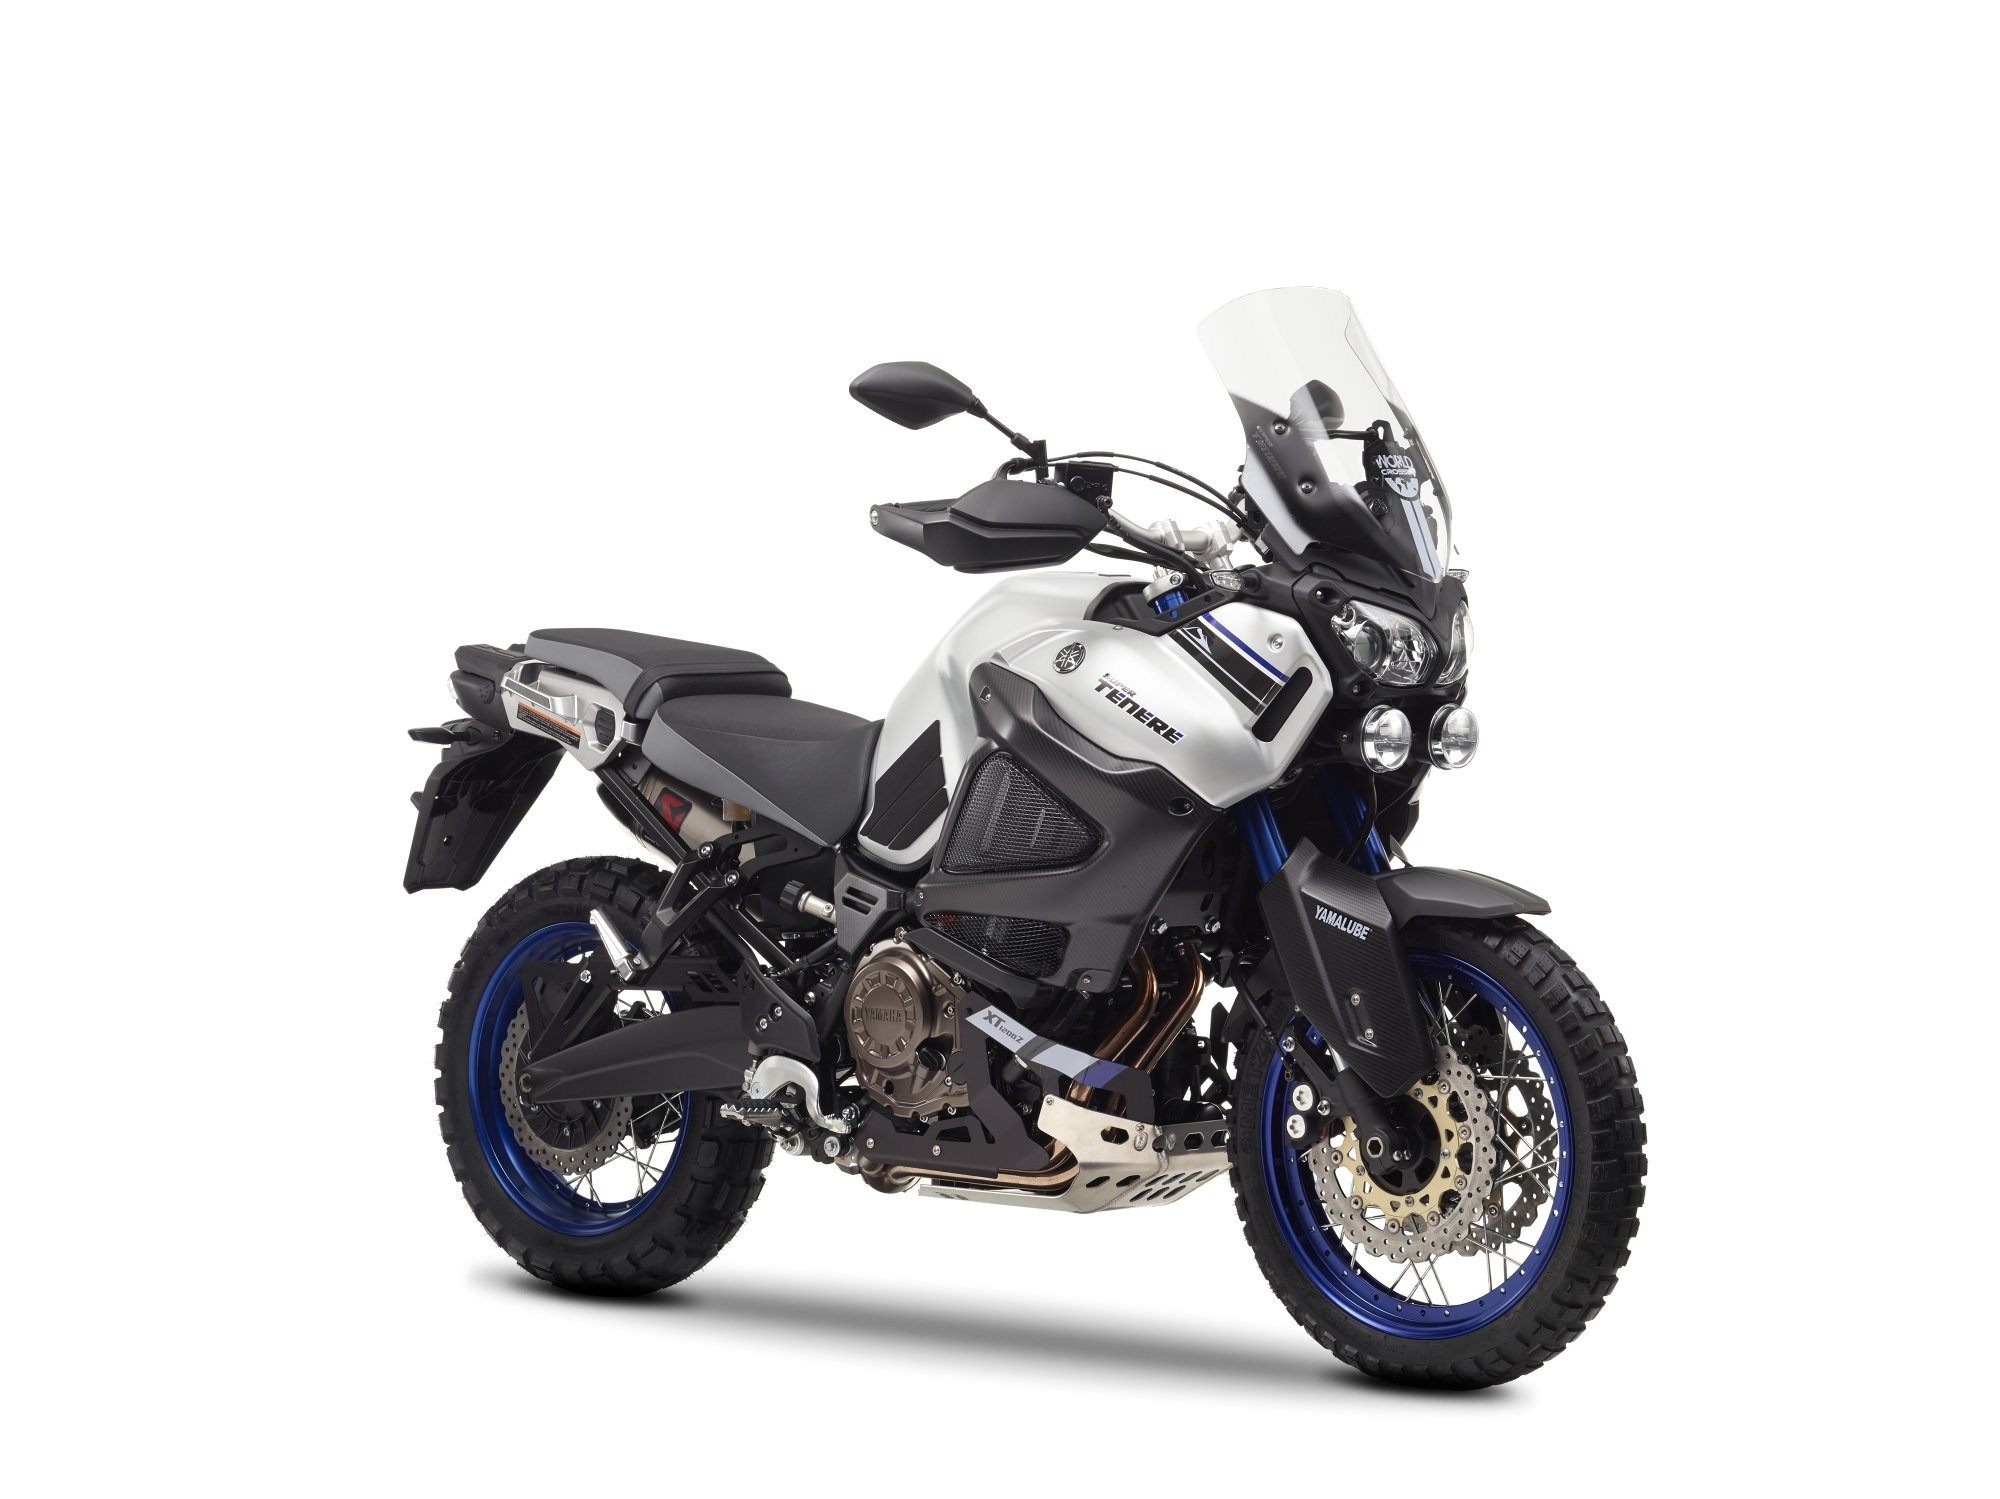 Yamaha Fjrae Specs